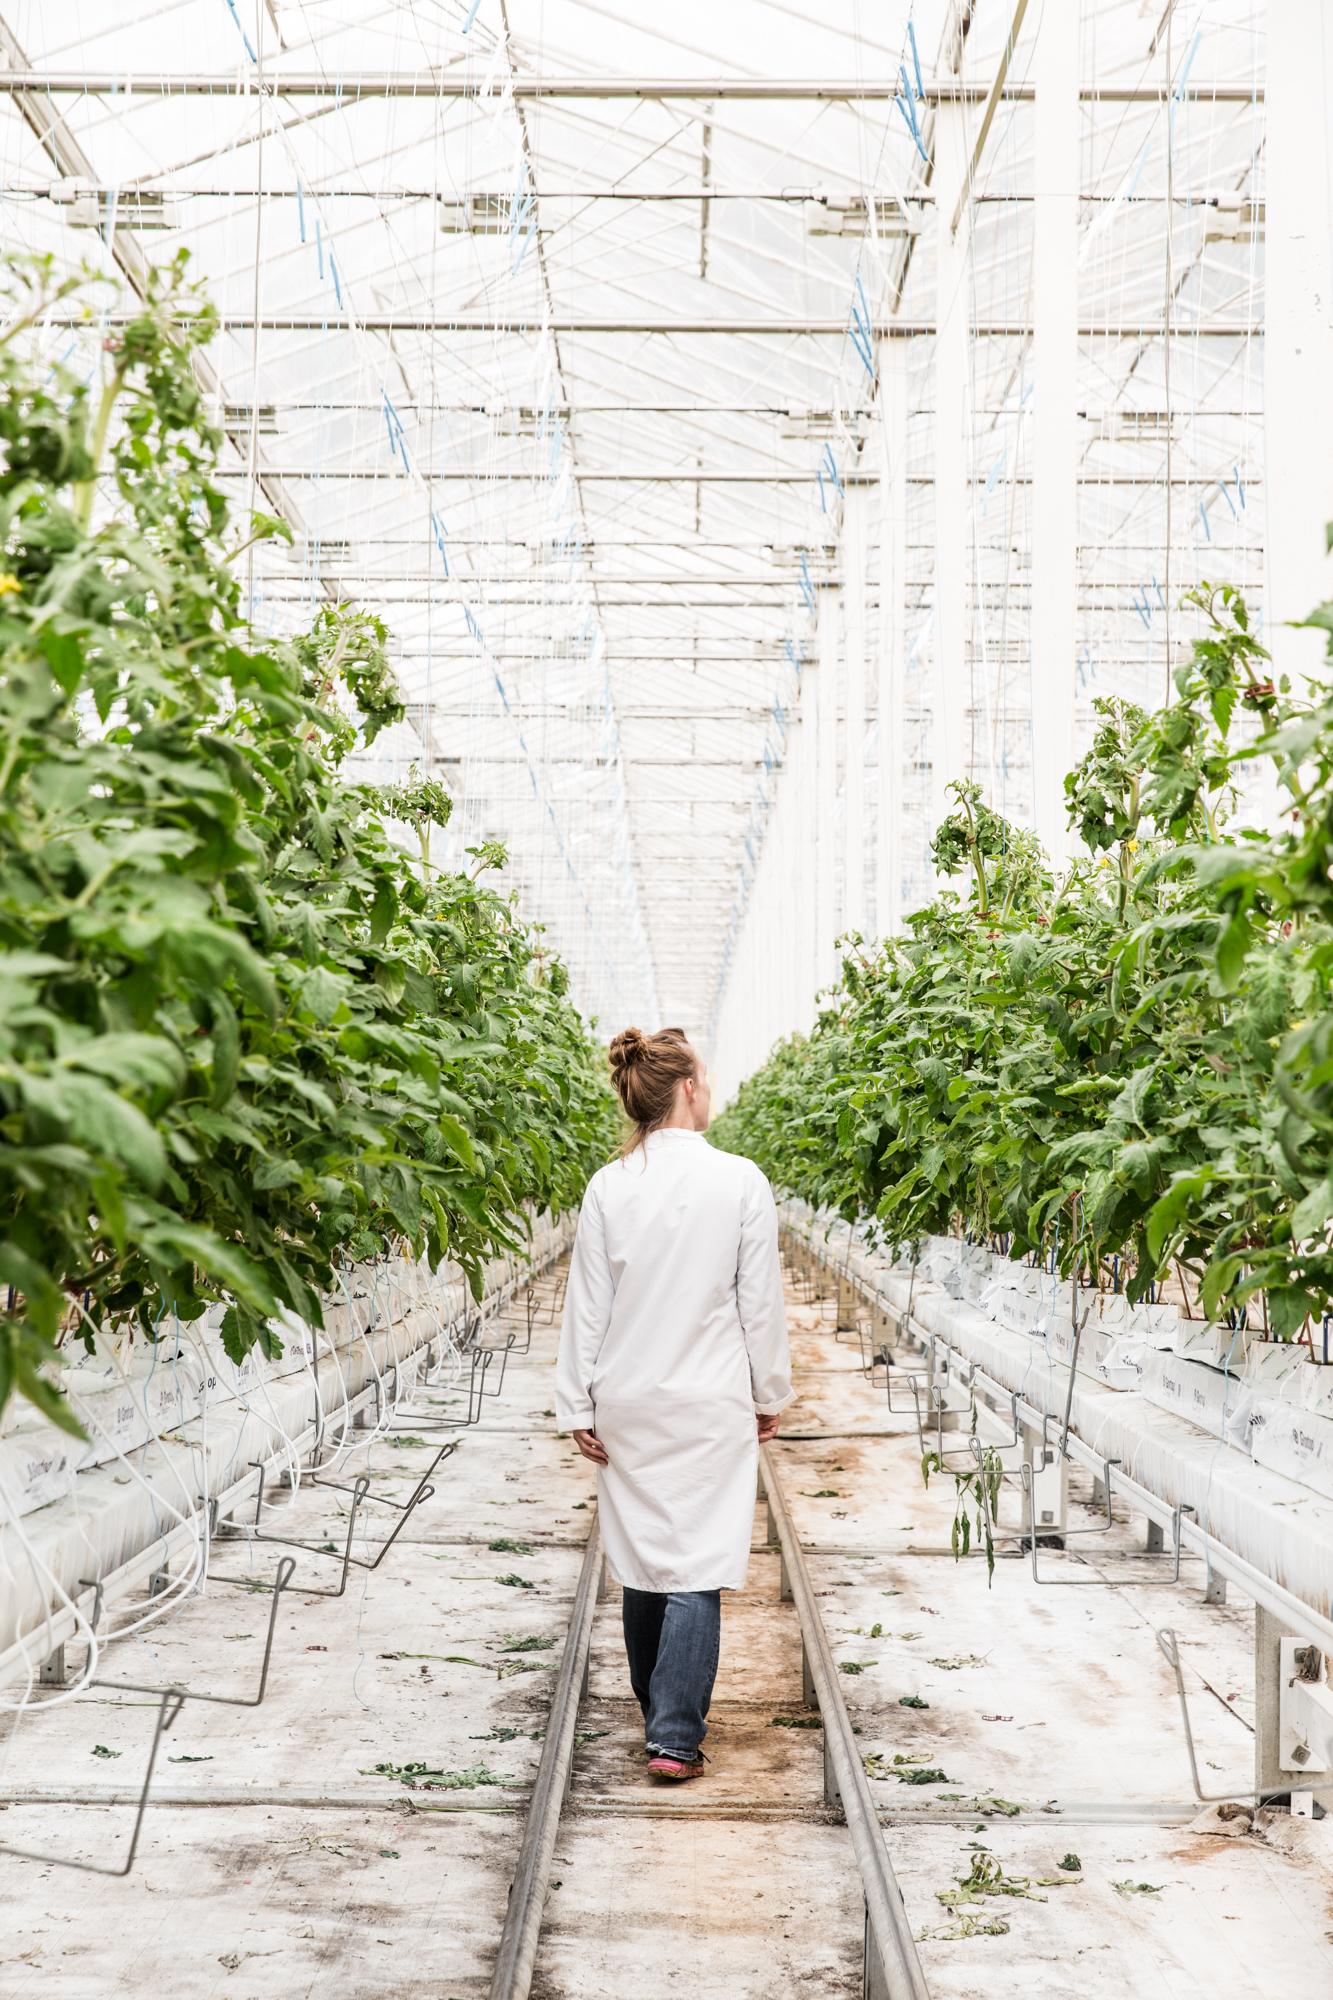 GRybus-Blog-Fresh-Greenhouses-9777.jpg